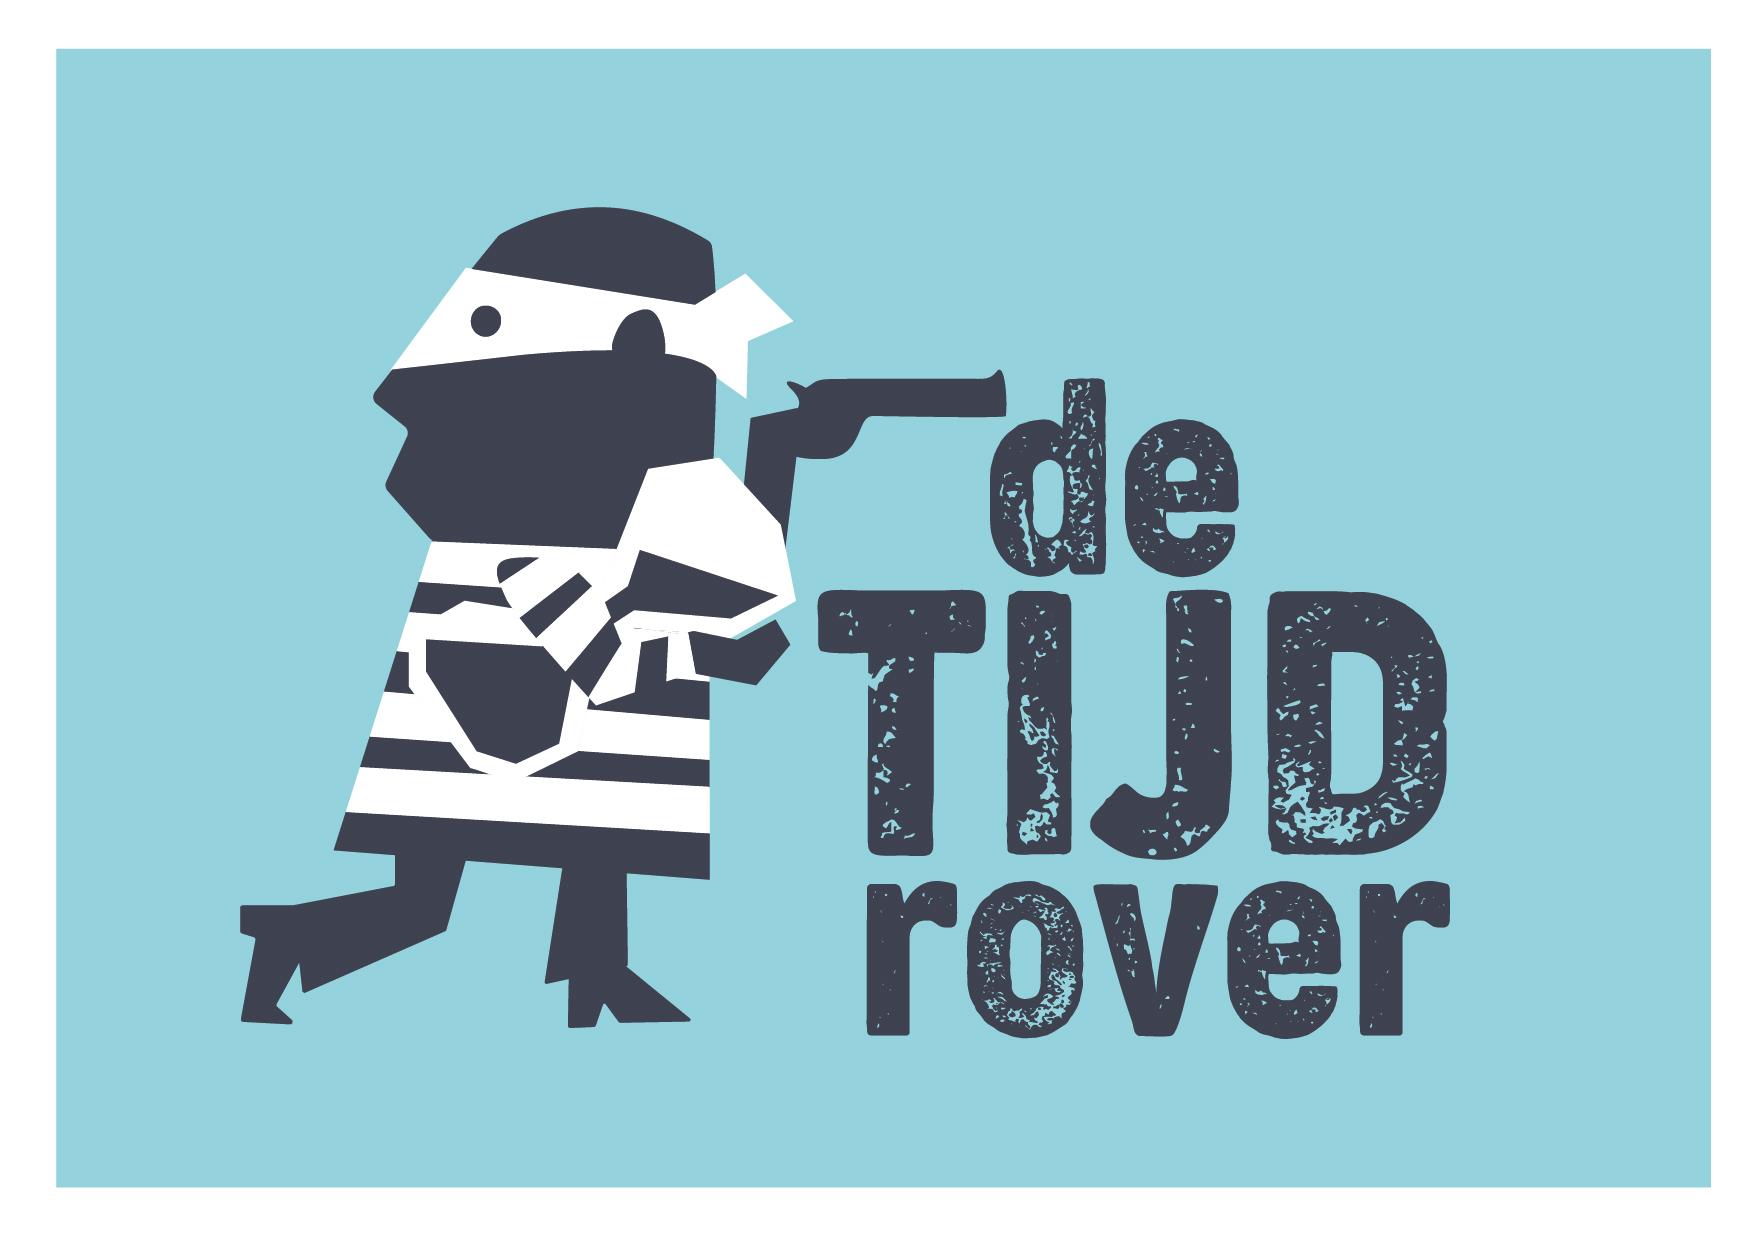 TijdRover_karakter_1_web